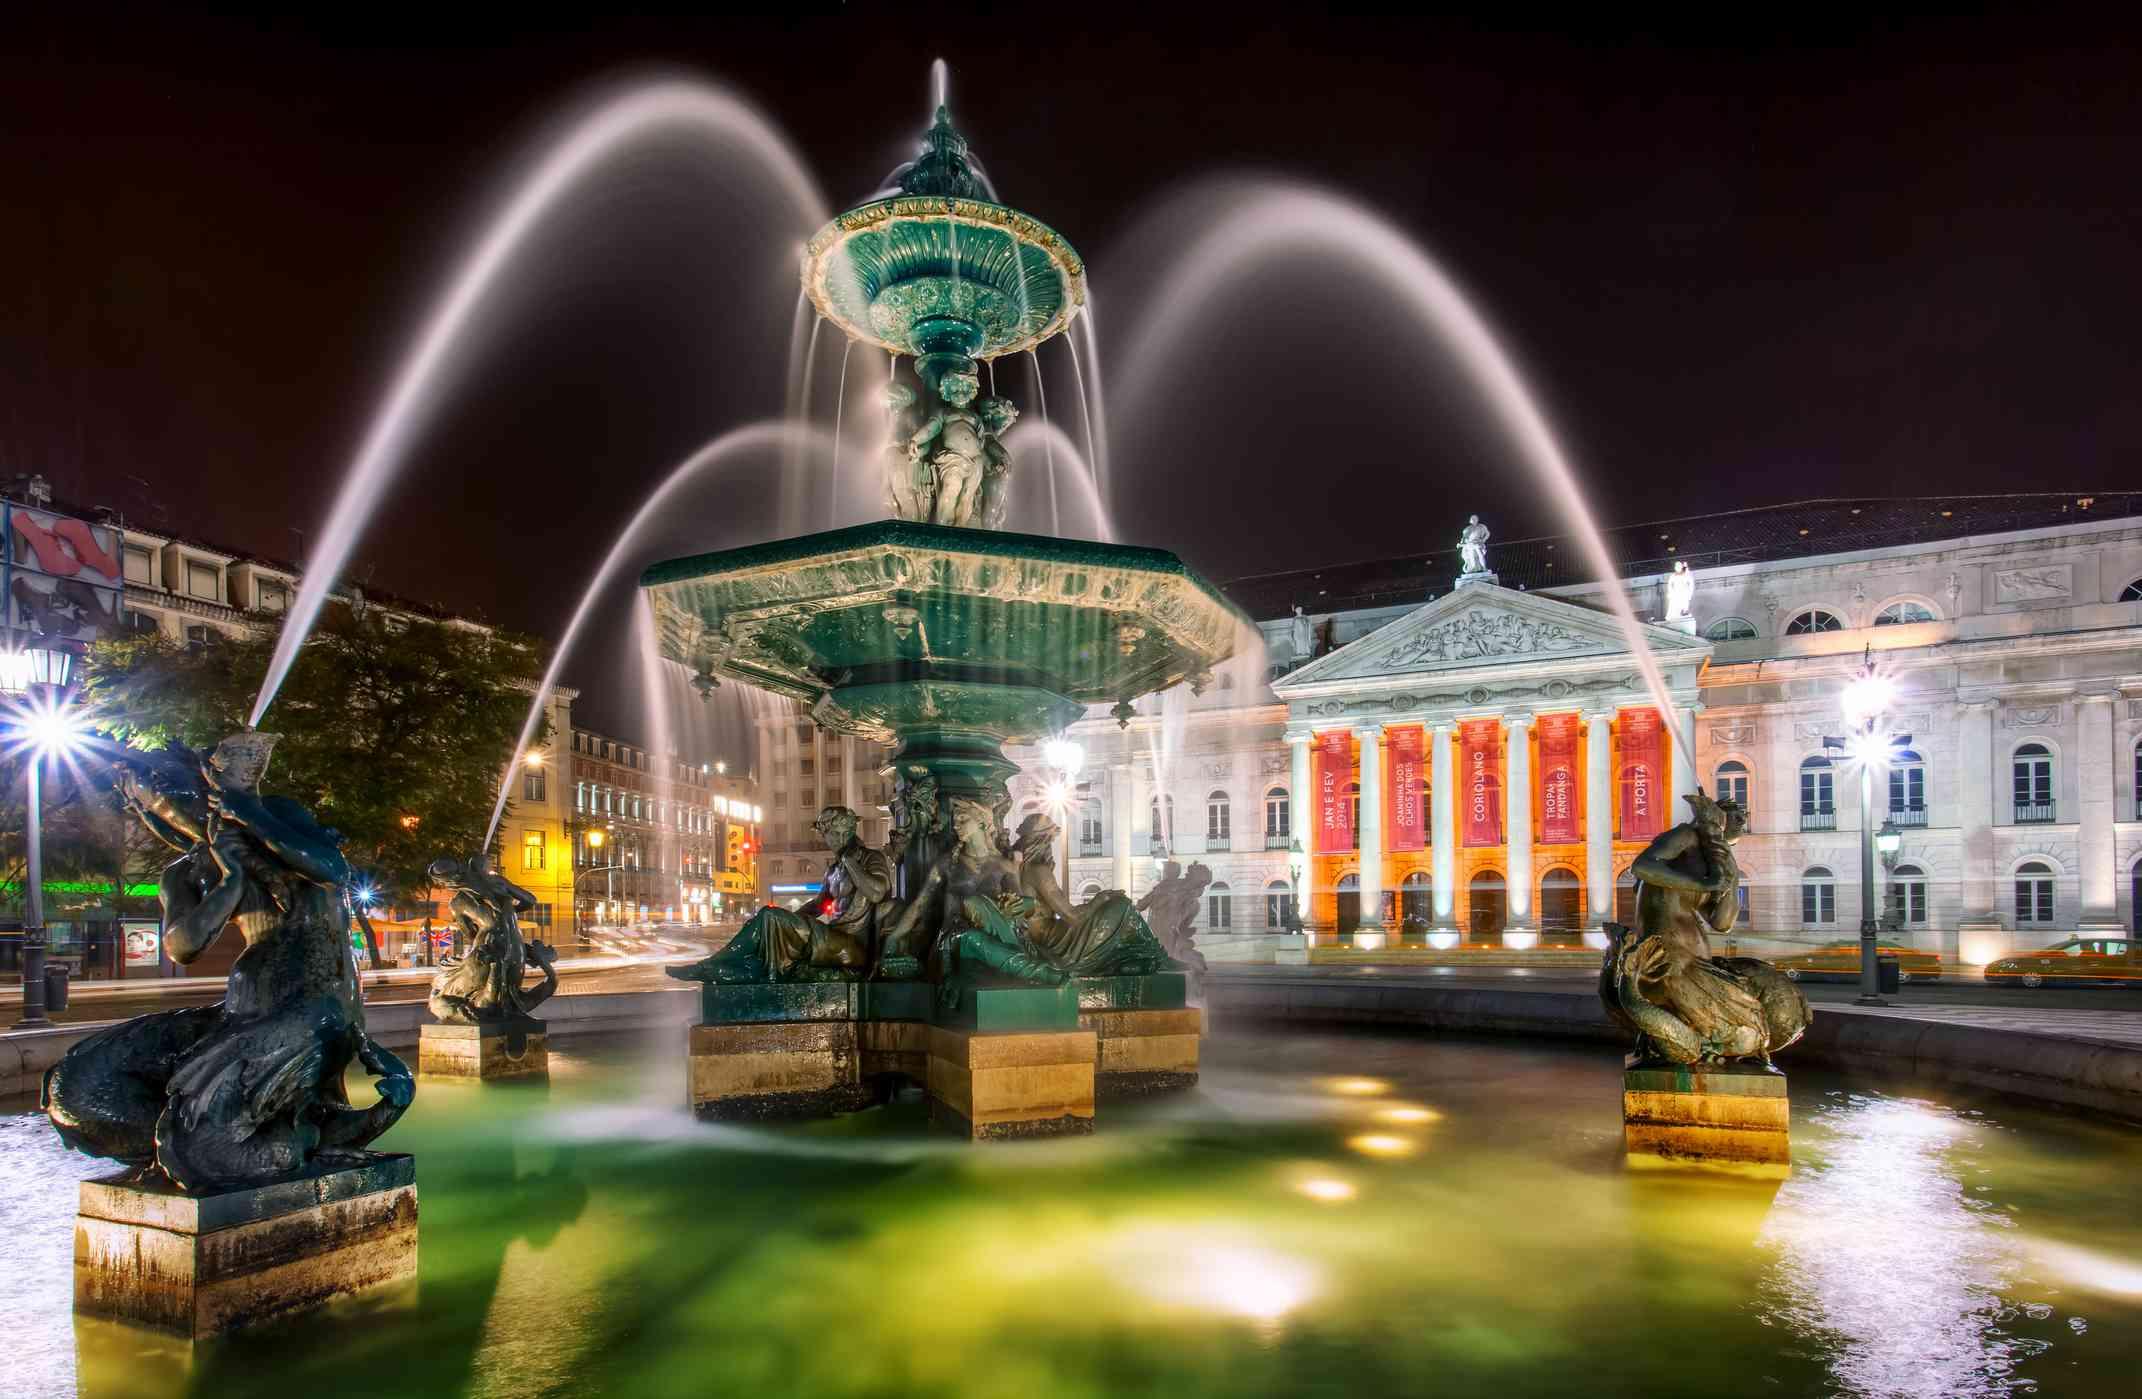 Lisbon fountain at night